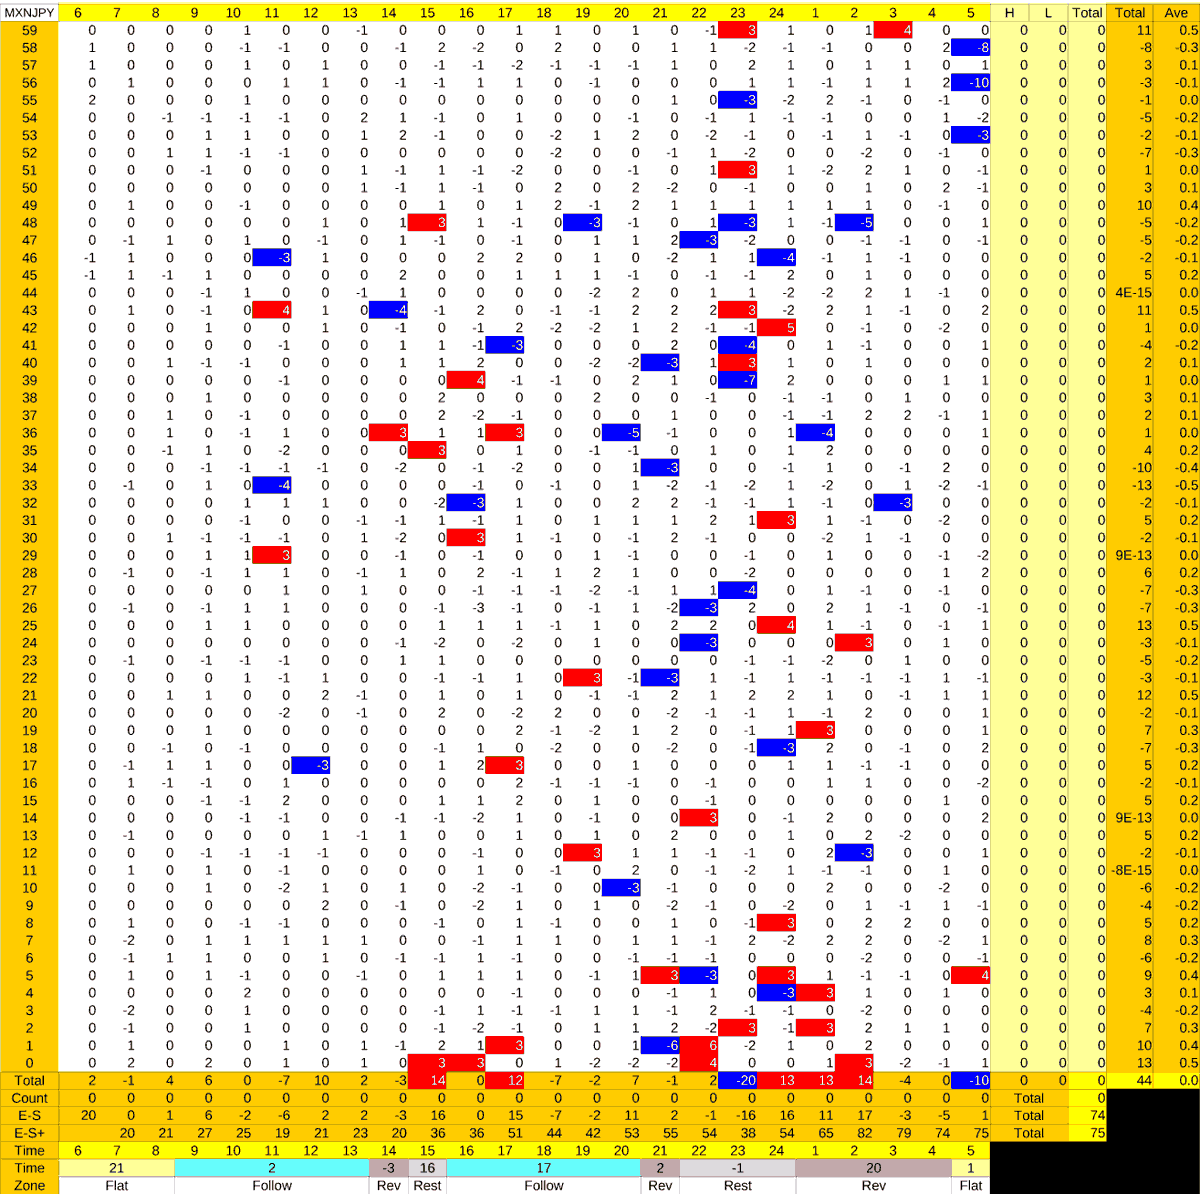 20210623_HS(3)MXNJPY